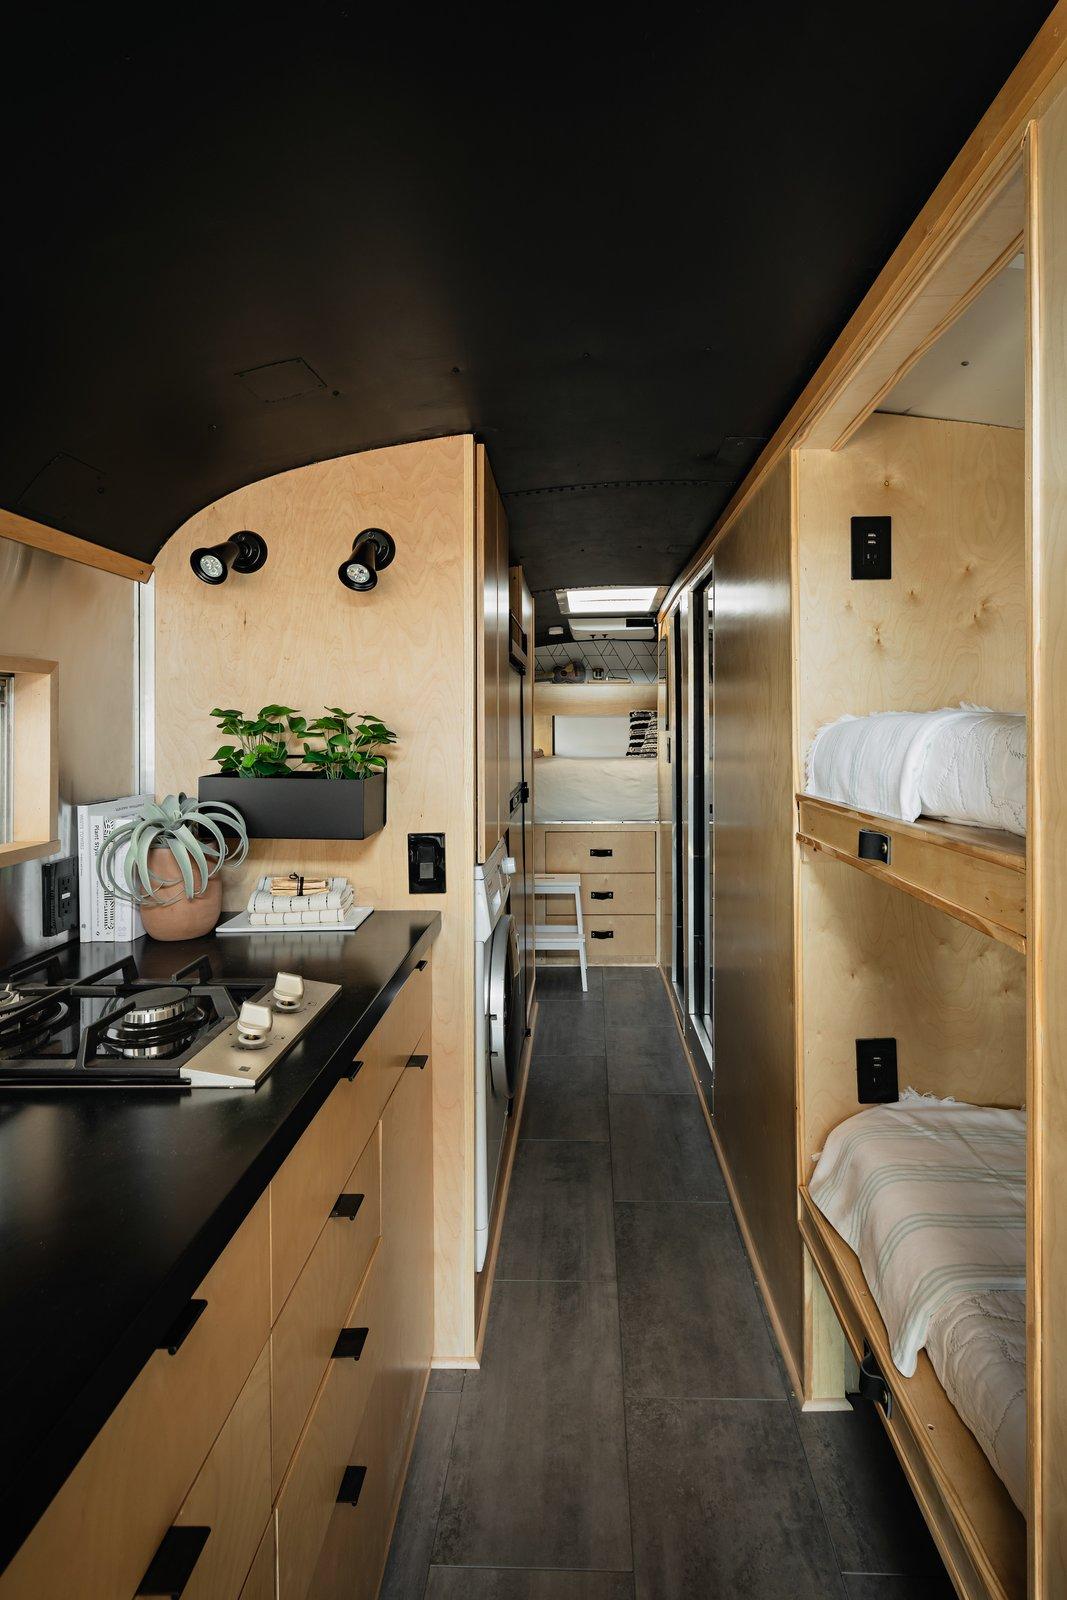 Kitchen and bunks of Scandinavian Skoolie by Killdisco Design.